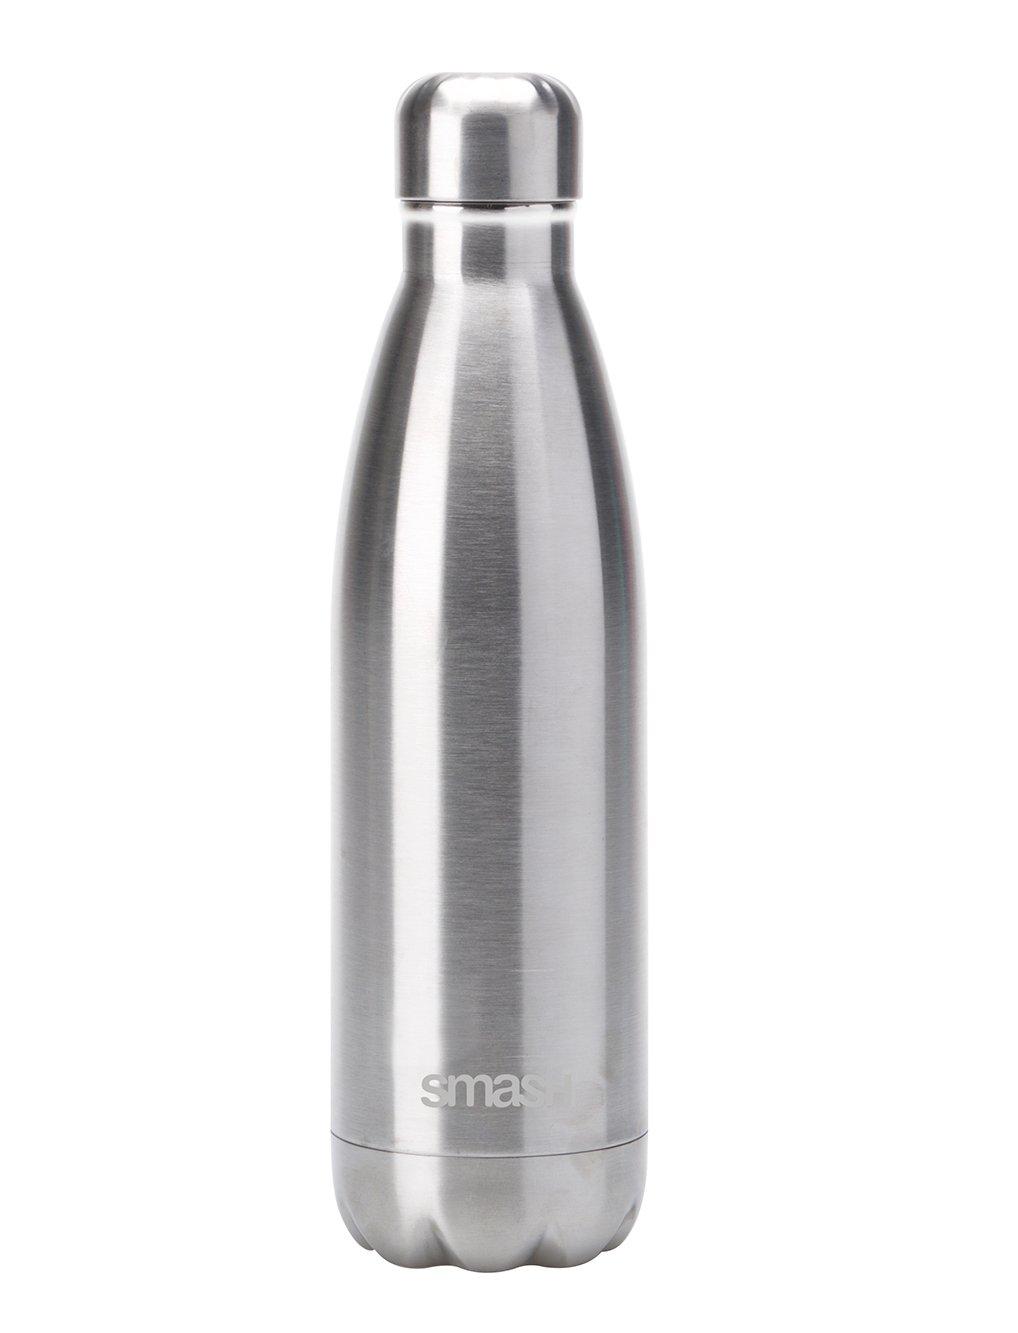 Smash Stainless Steel Silver Bottle - 500ml